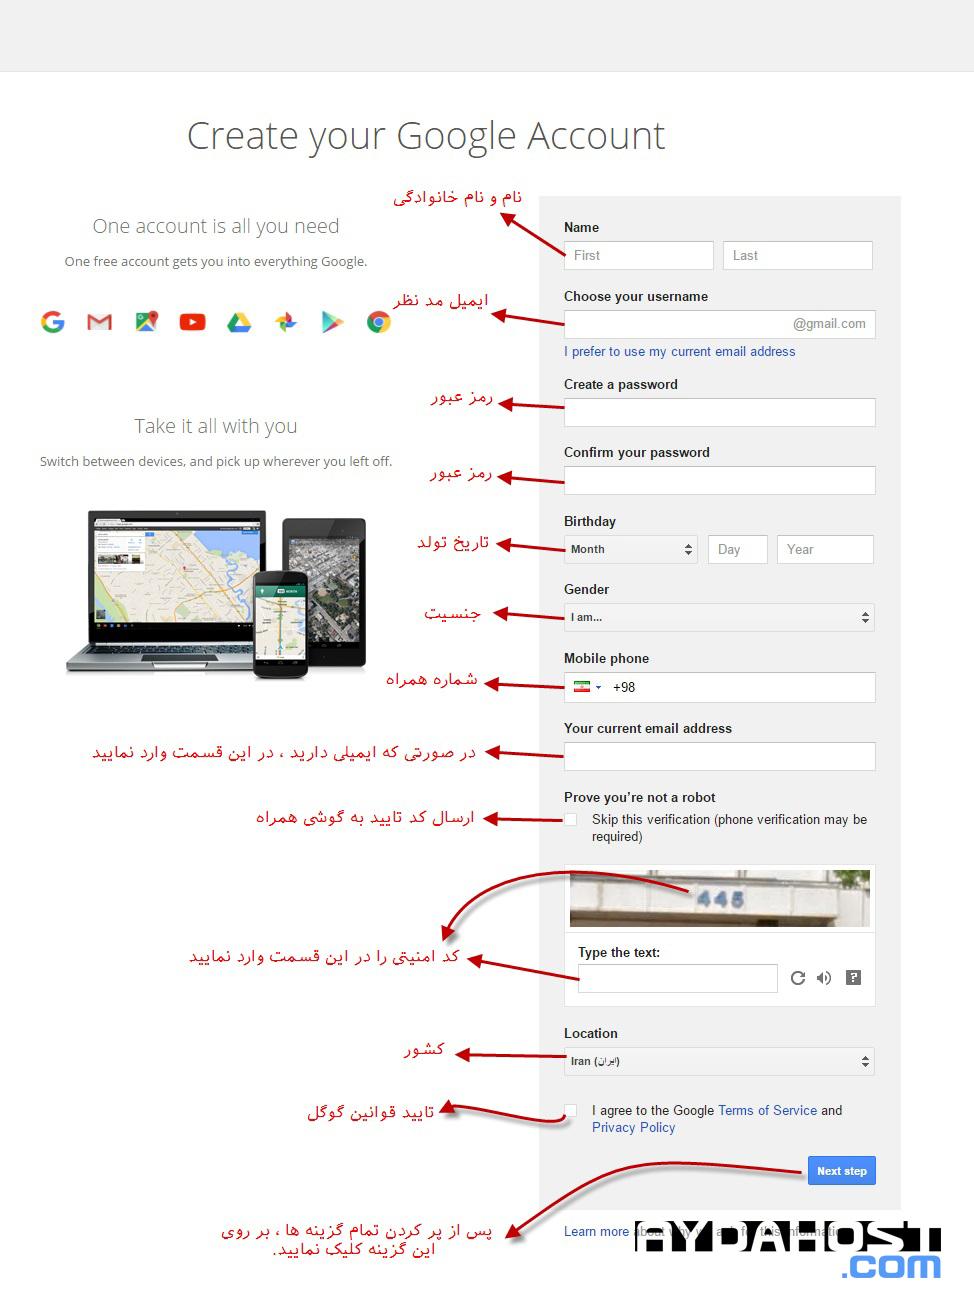 آموزش ساخت ايميل در گوگل (جيميل) -3